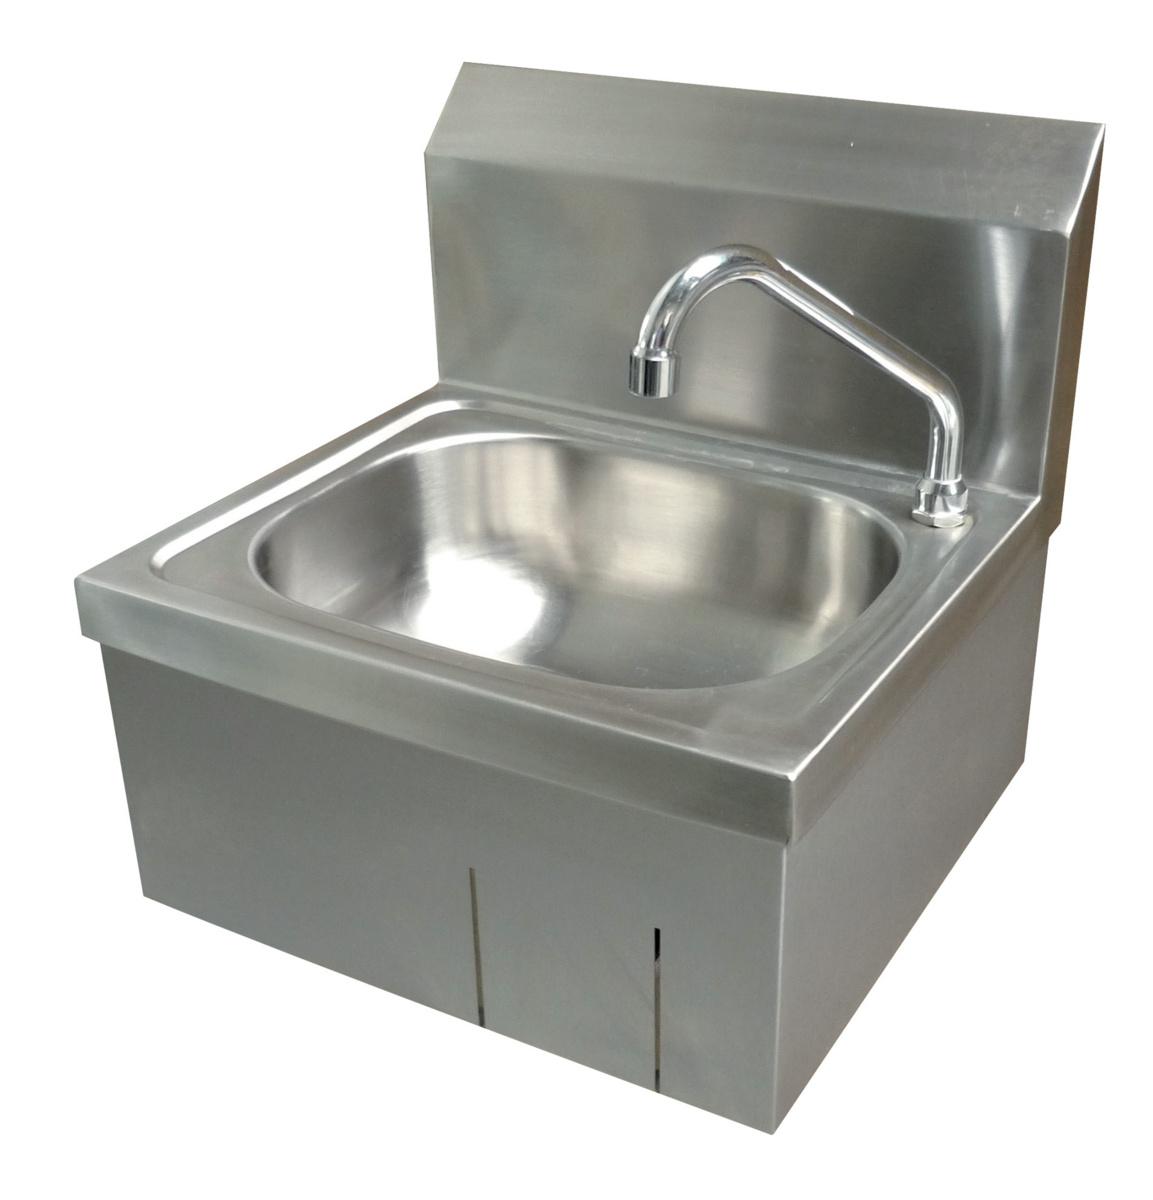 Lave-mains inox 33x40 cm